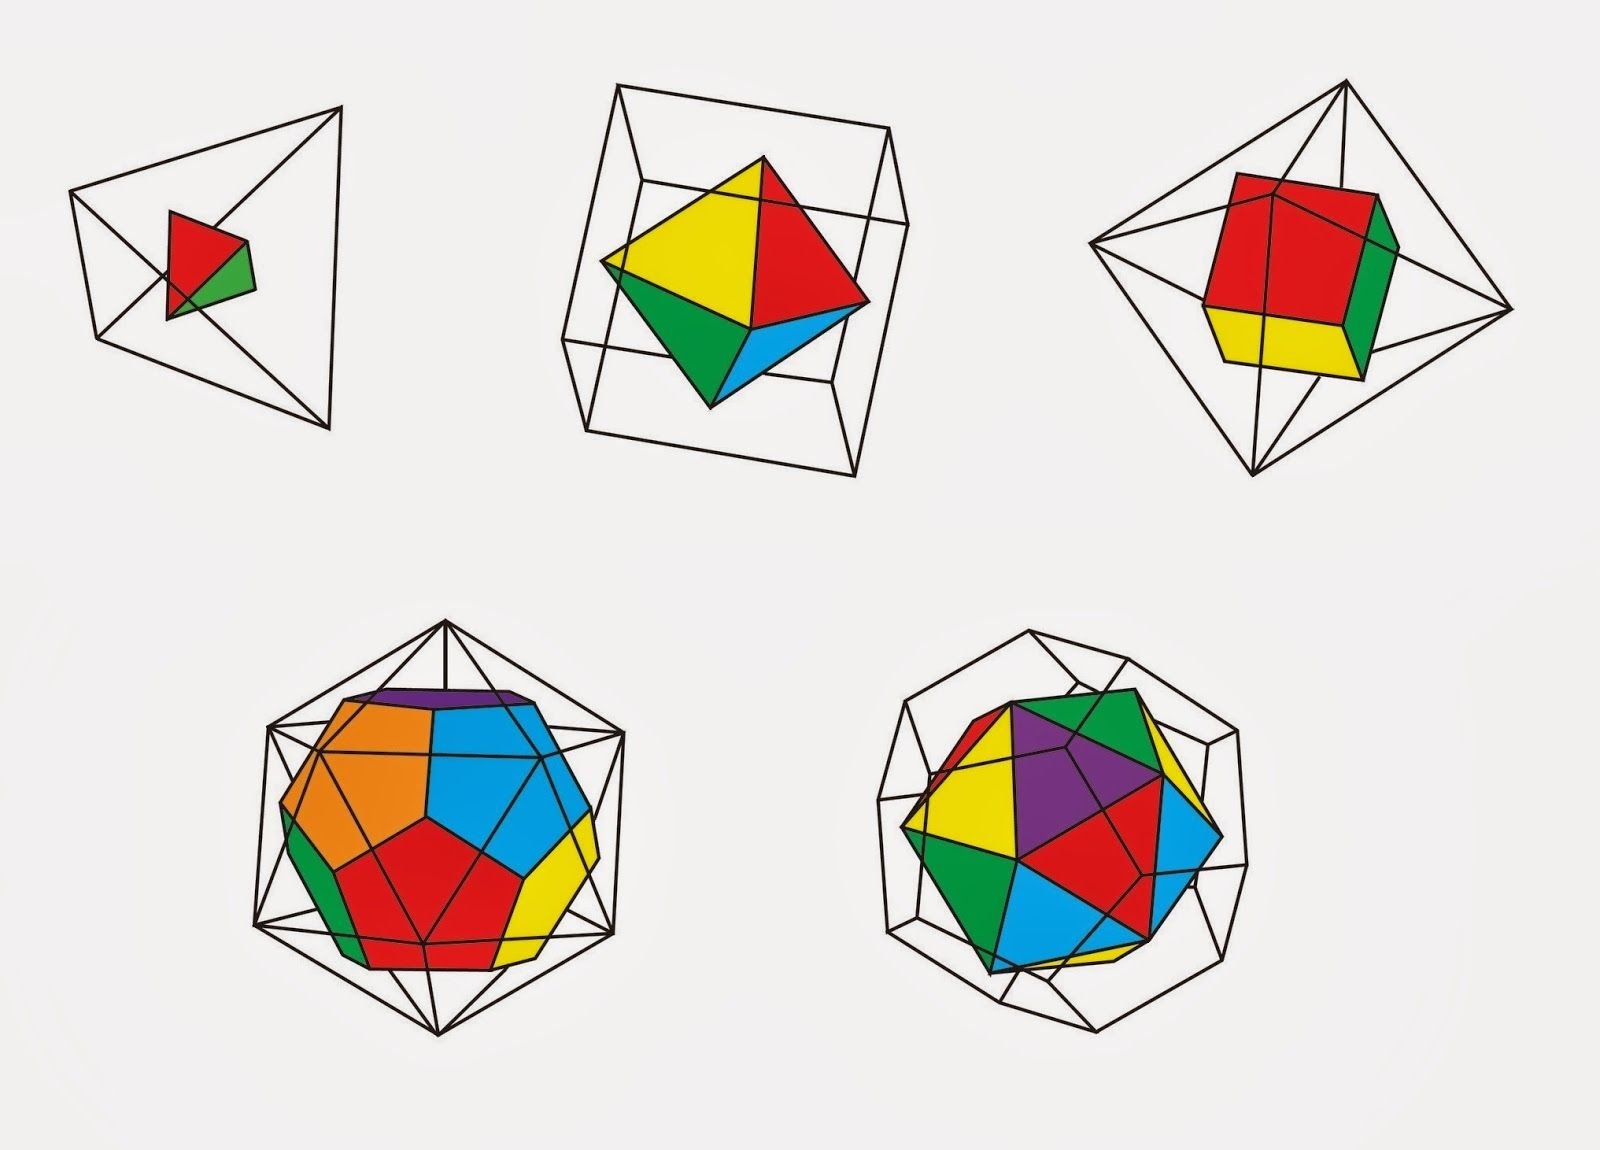 poliedros regulares duales